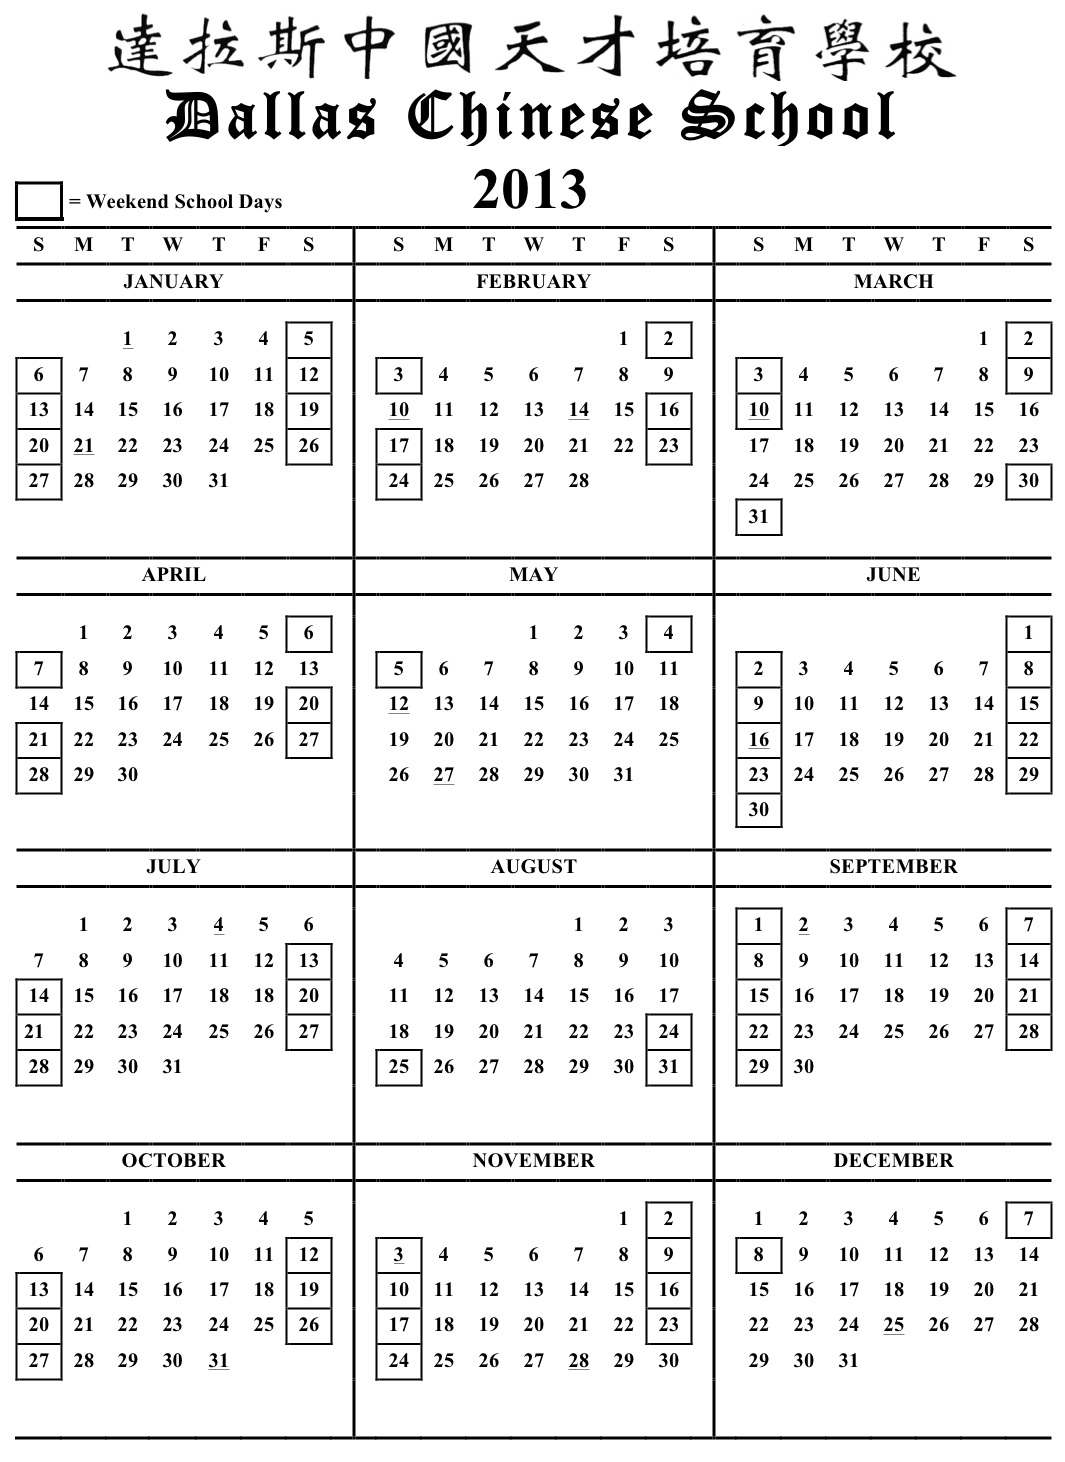 New 2013 Calendar Released! Download 2013 Spring ...